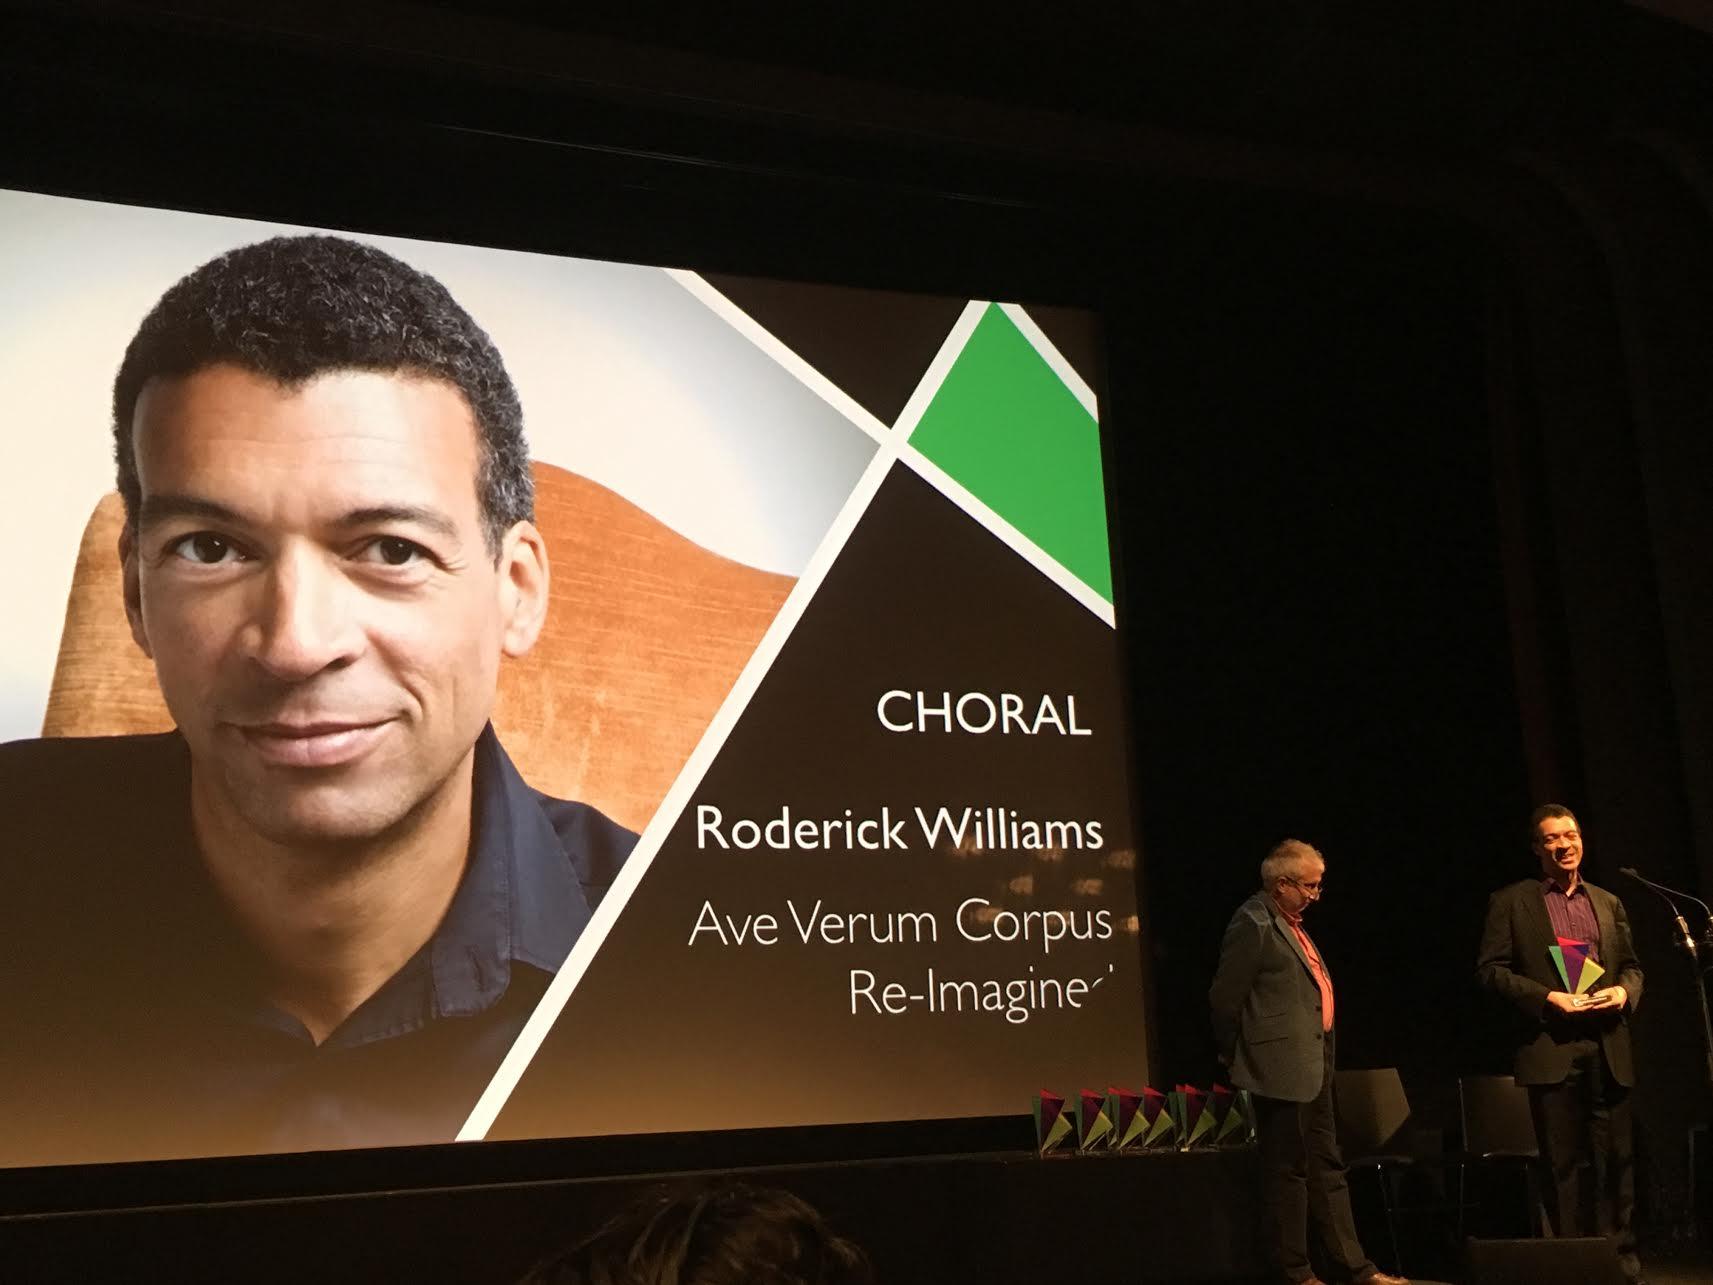 Roderick Williams at the British Composer Awards, 6th December 2016, accepting his Award at the BFI Southbank